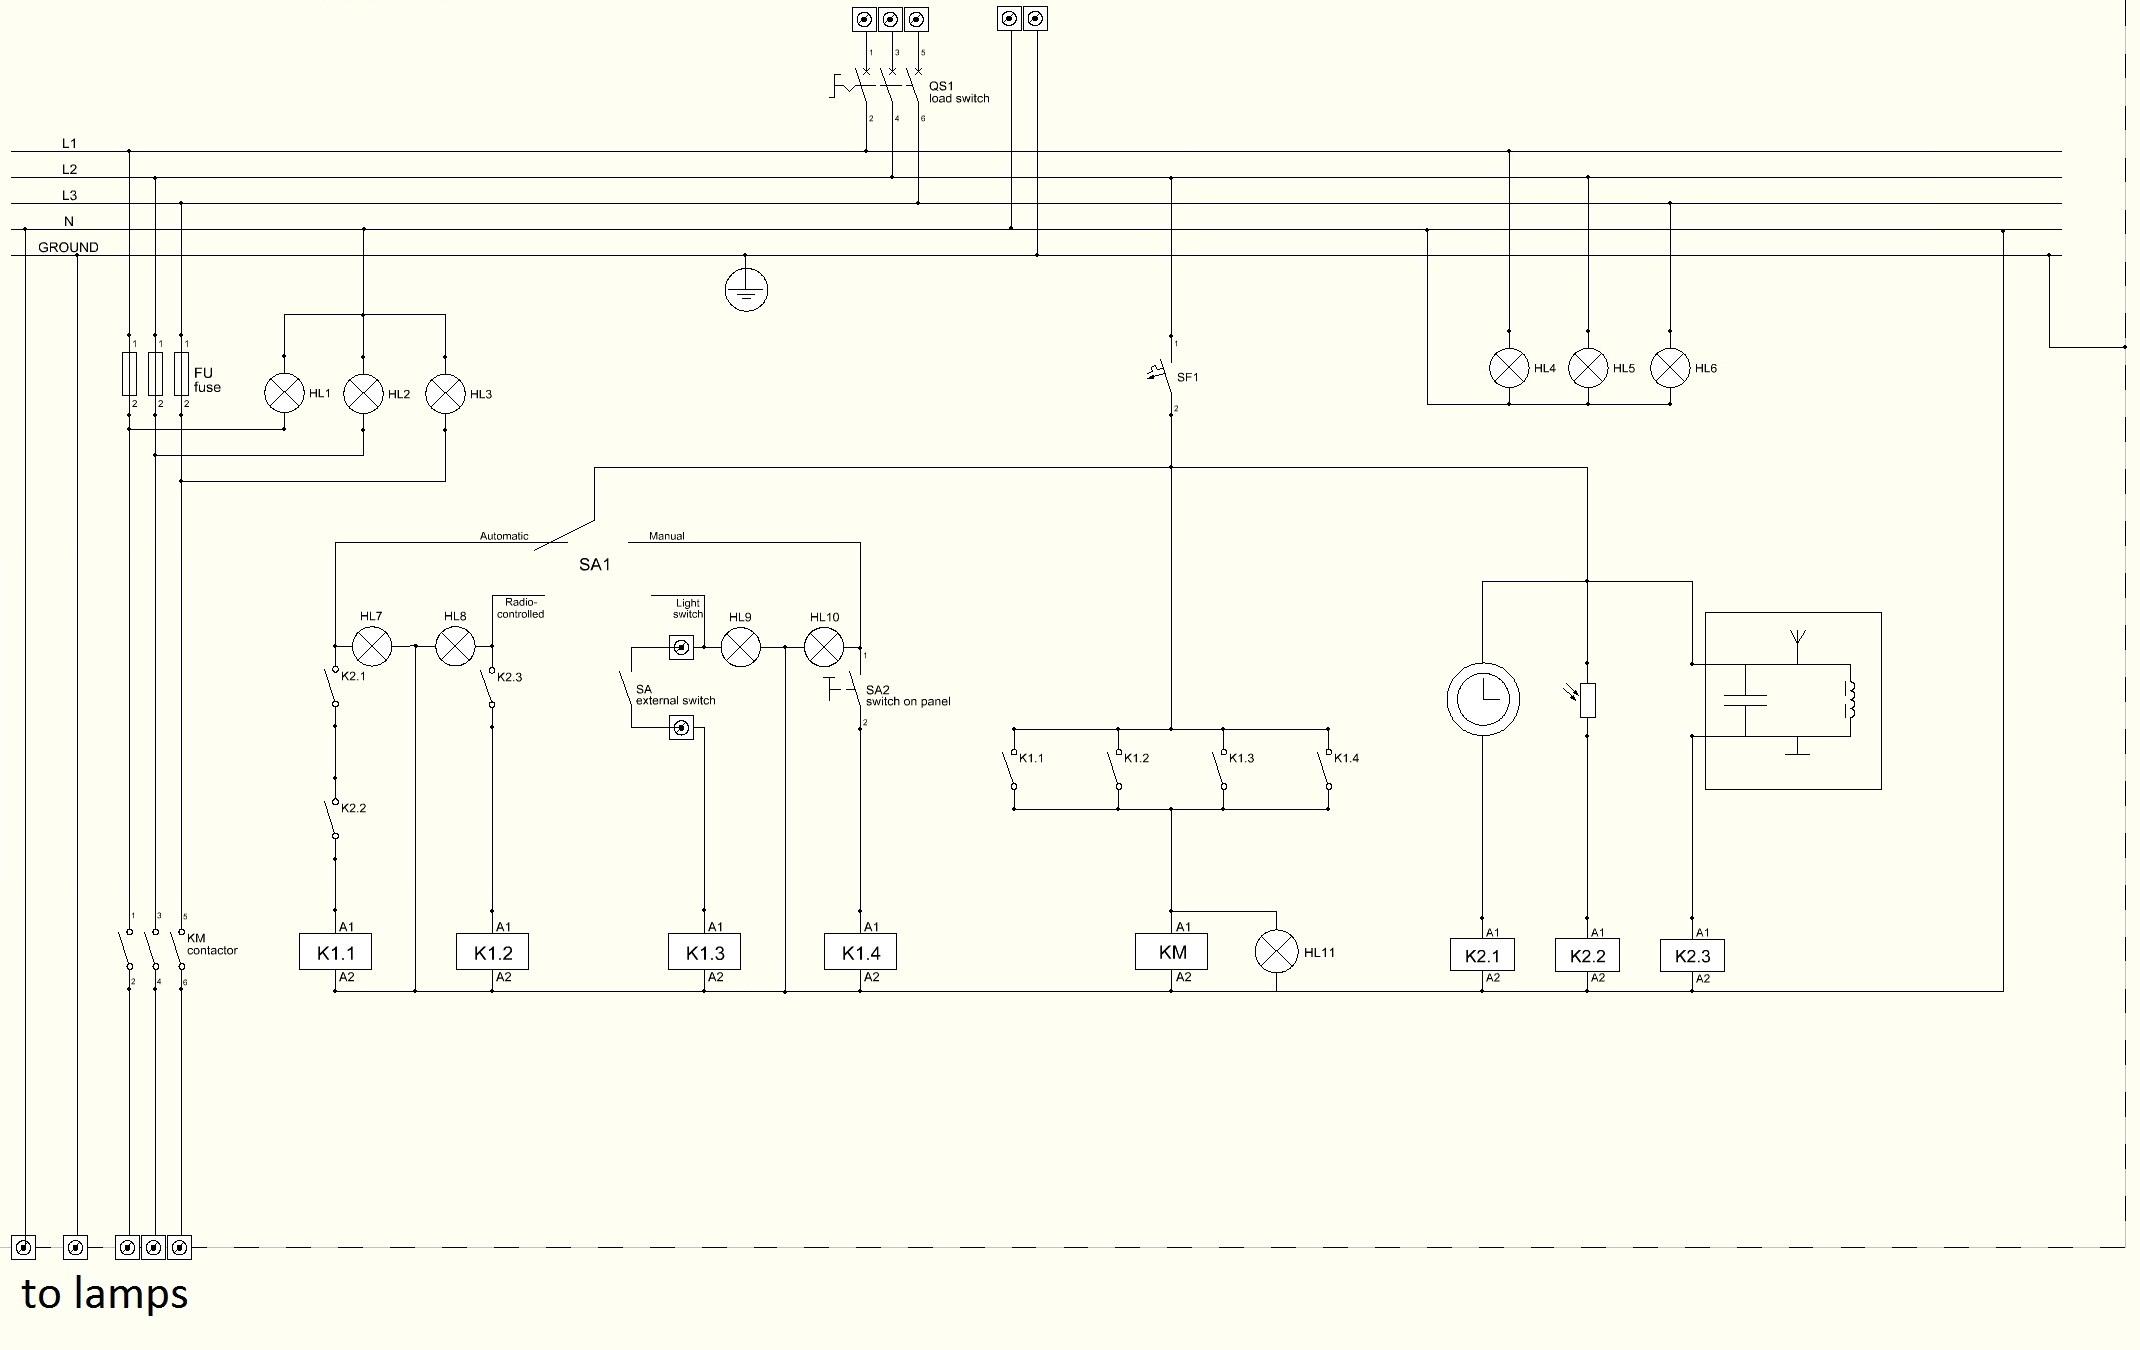 Focus Wiring Diagram Moreover 2014 Ford Focus Radio Wiring Diagram